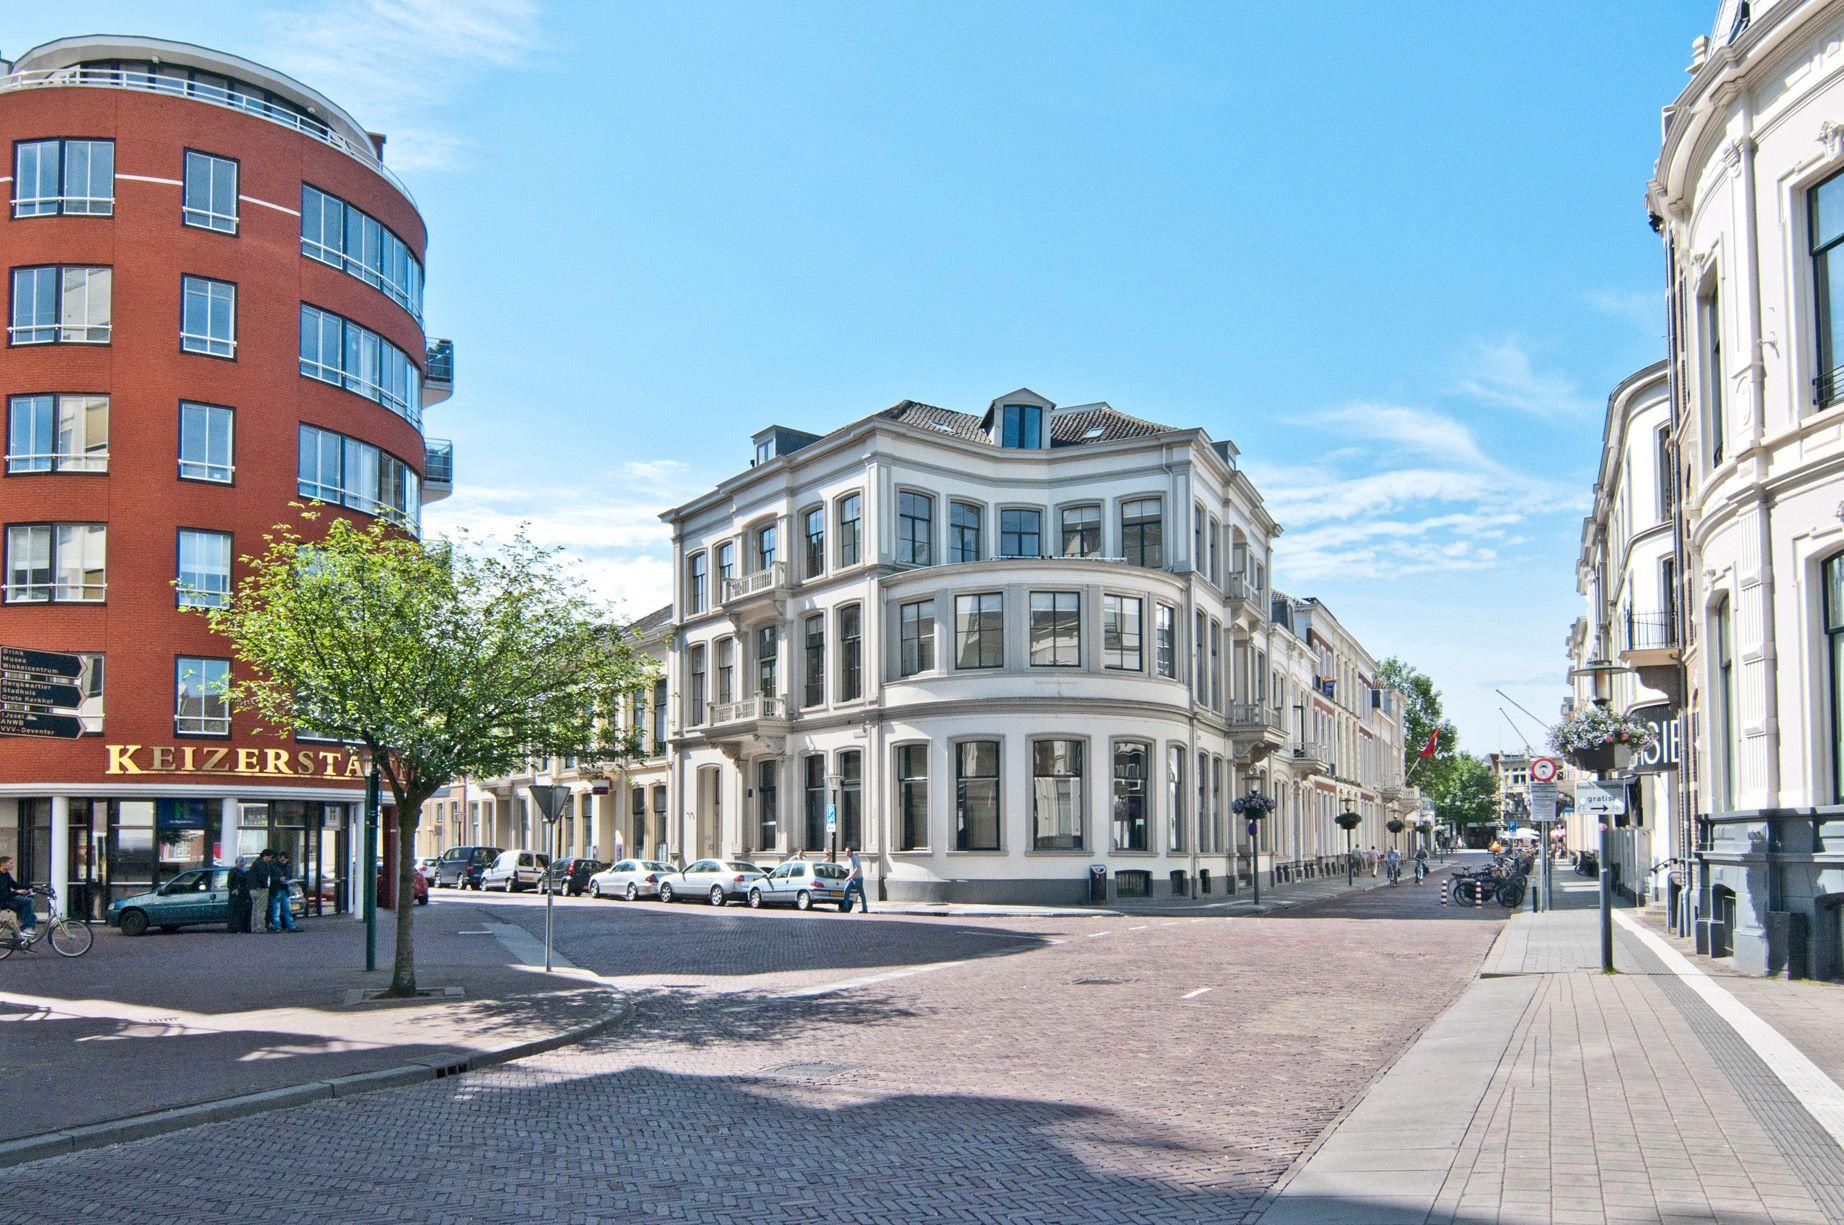 hotel keizerstraat